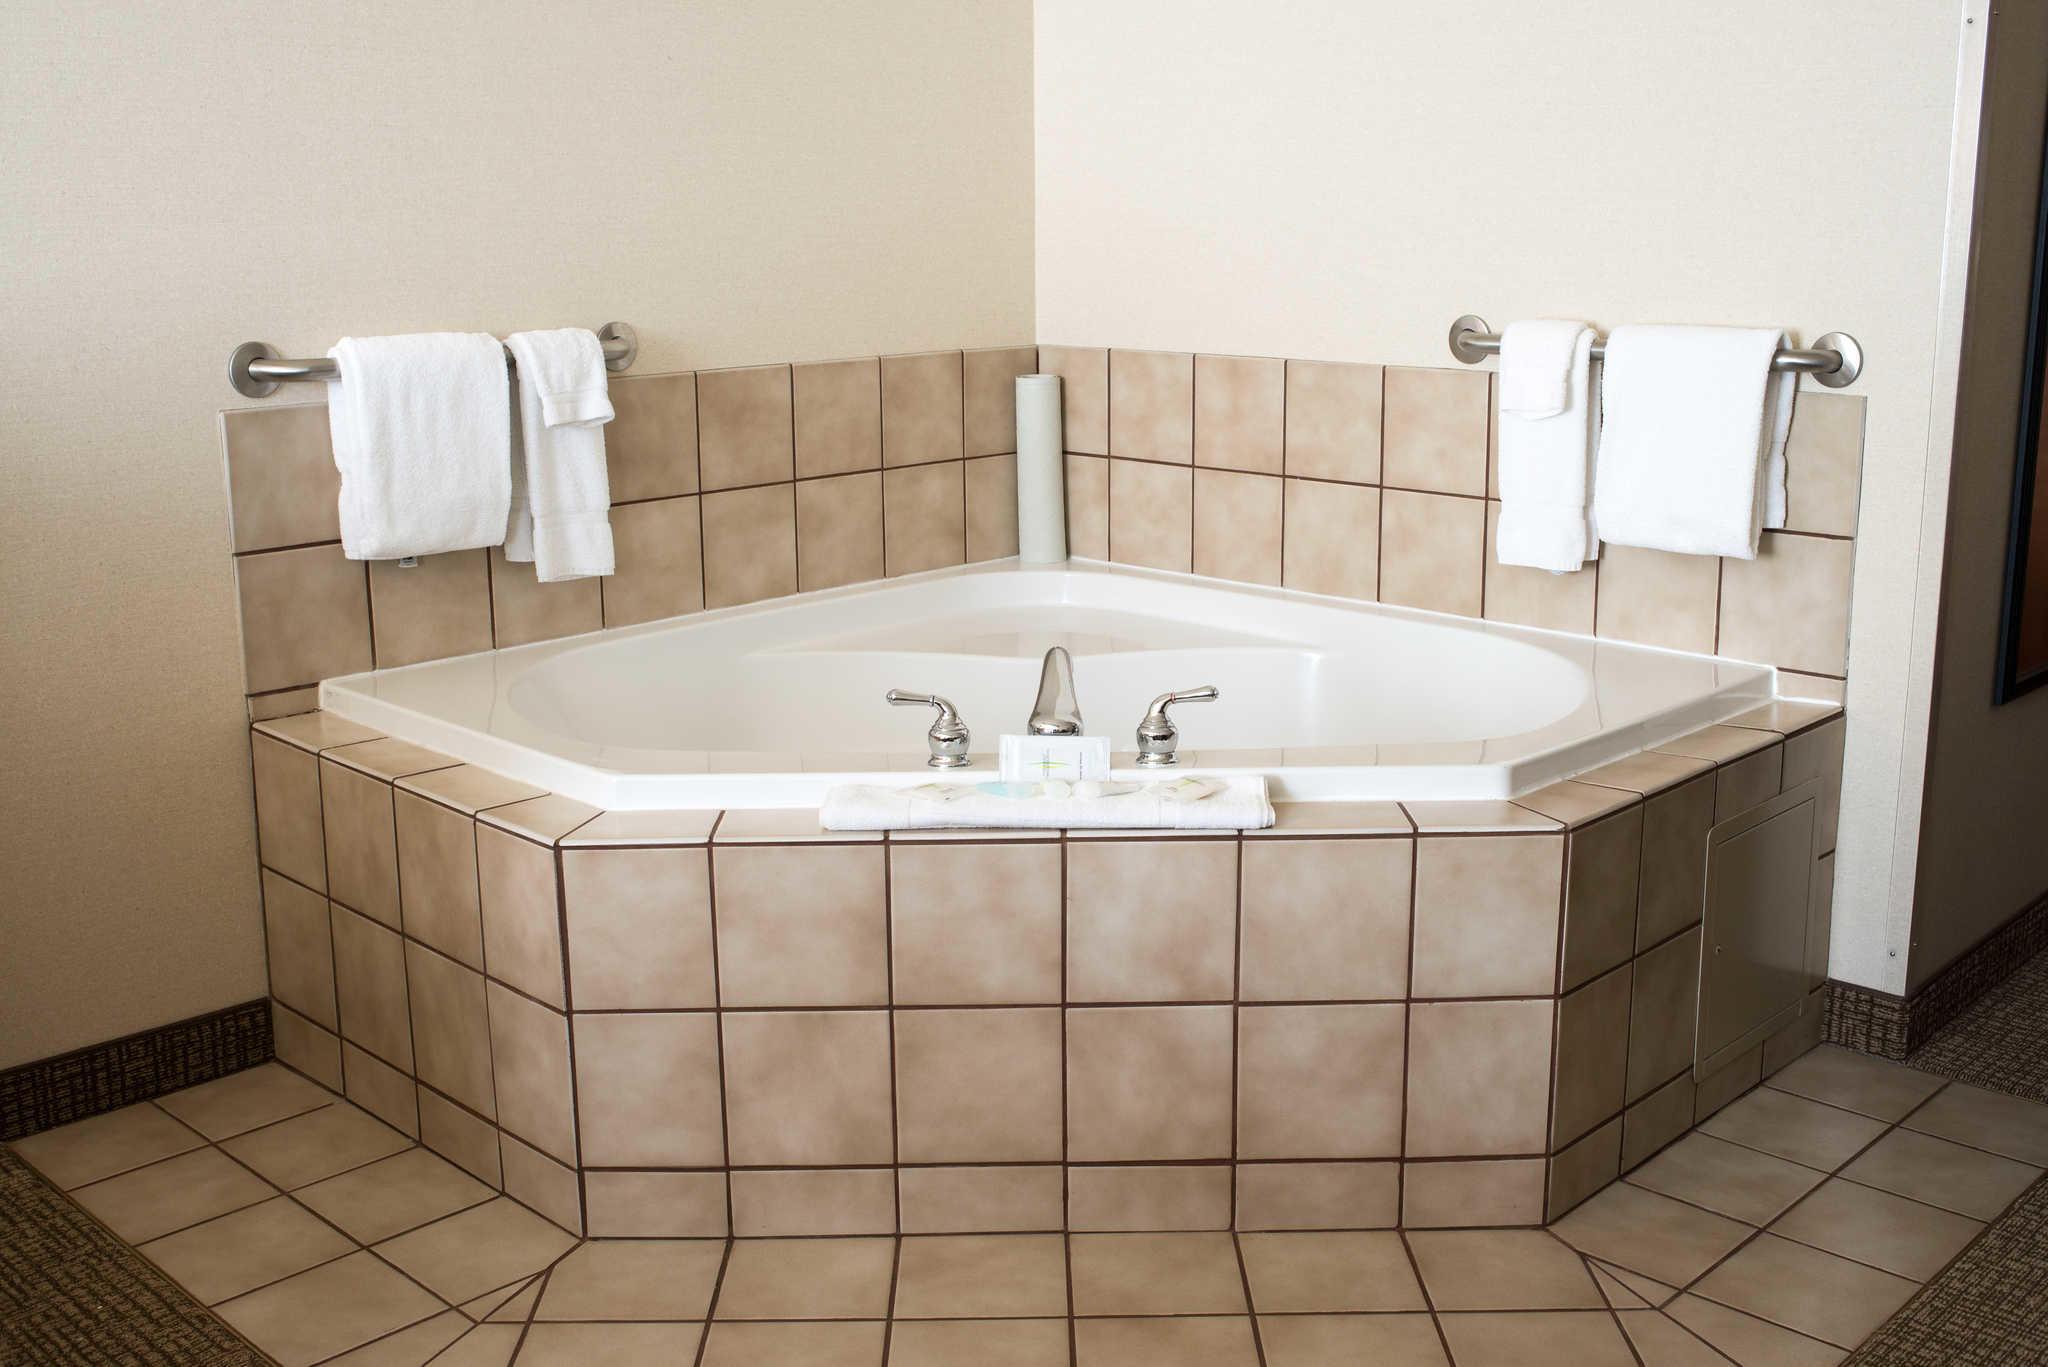 Comfort Suites image 11